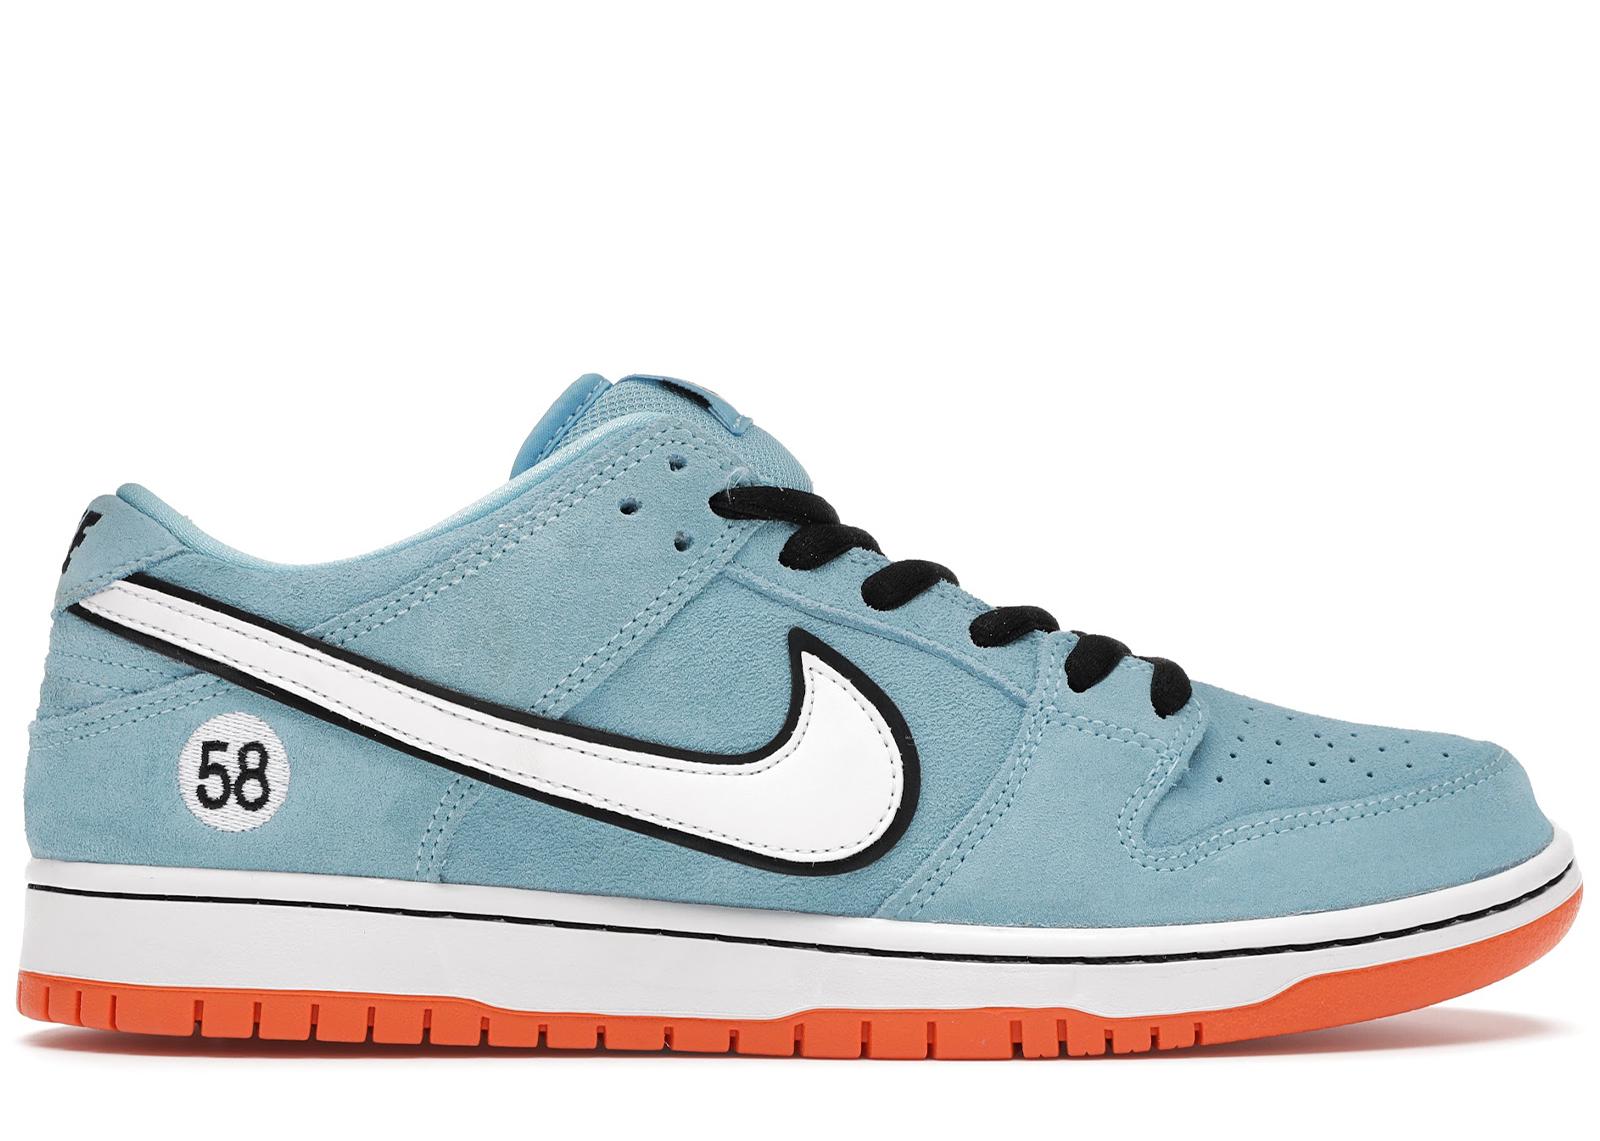 Nike SB Dunk Low Club 58 Gulf - BQ6817-401